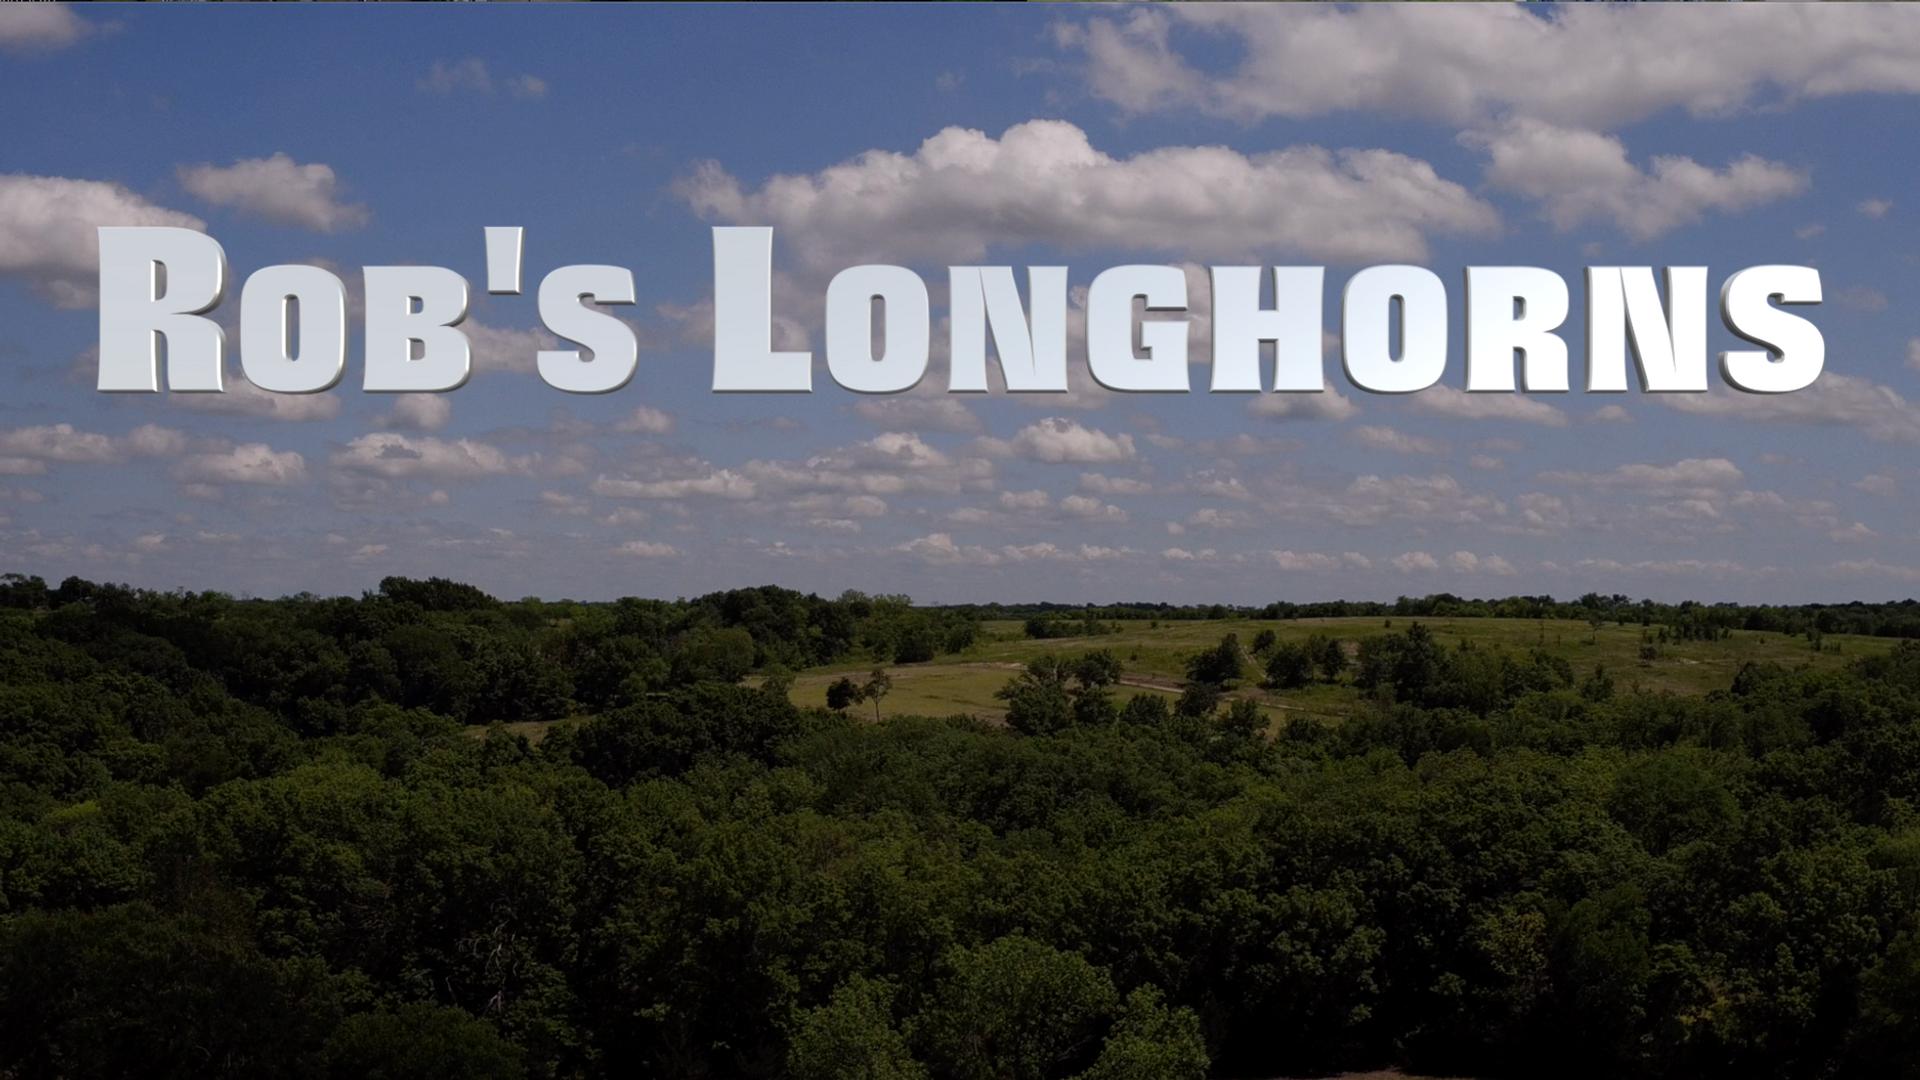 Rob's Longhorns